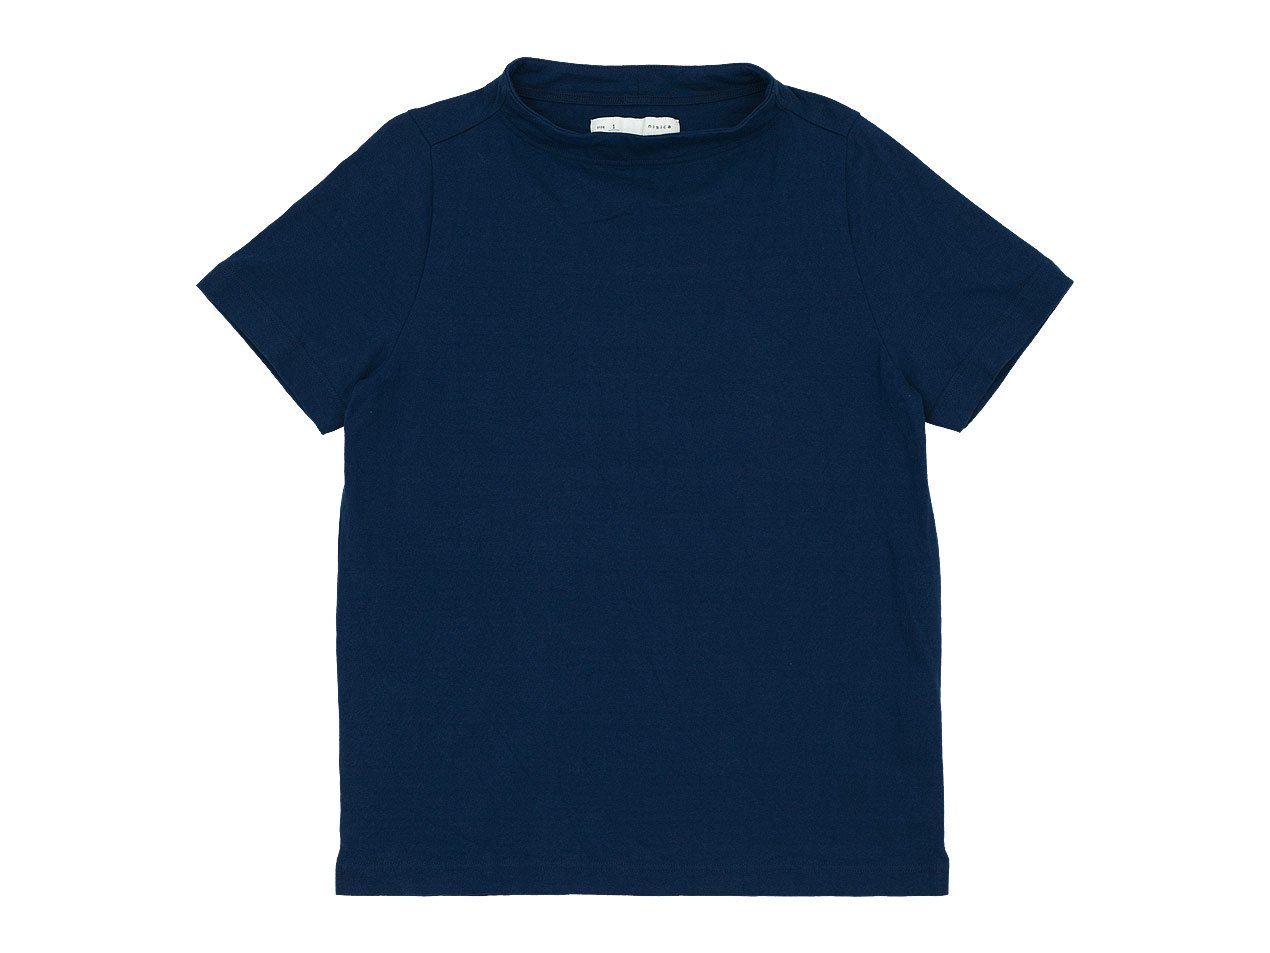 nisica ガンジーネックカットソー 半袖 BLUE